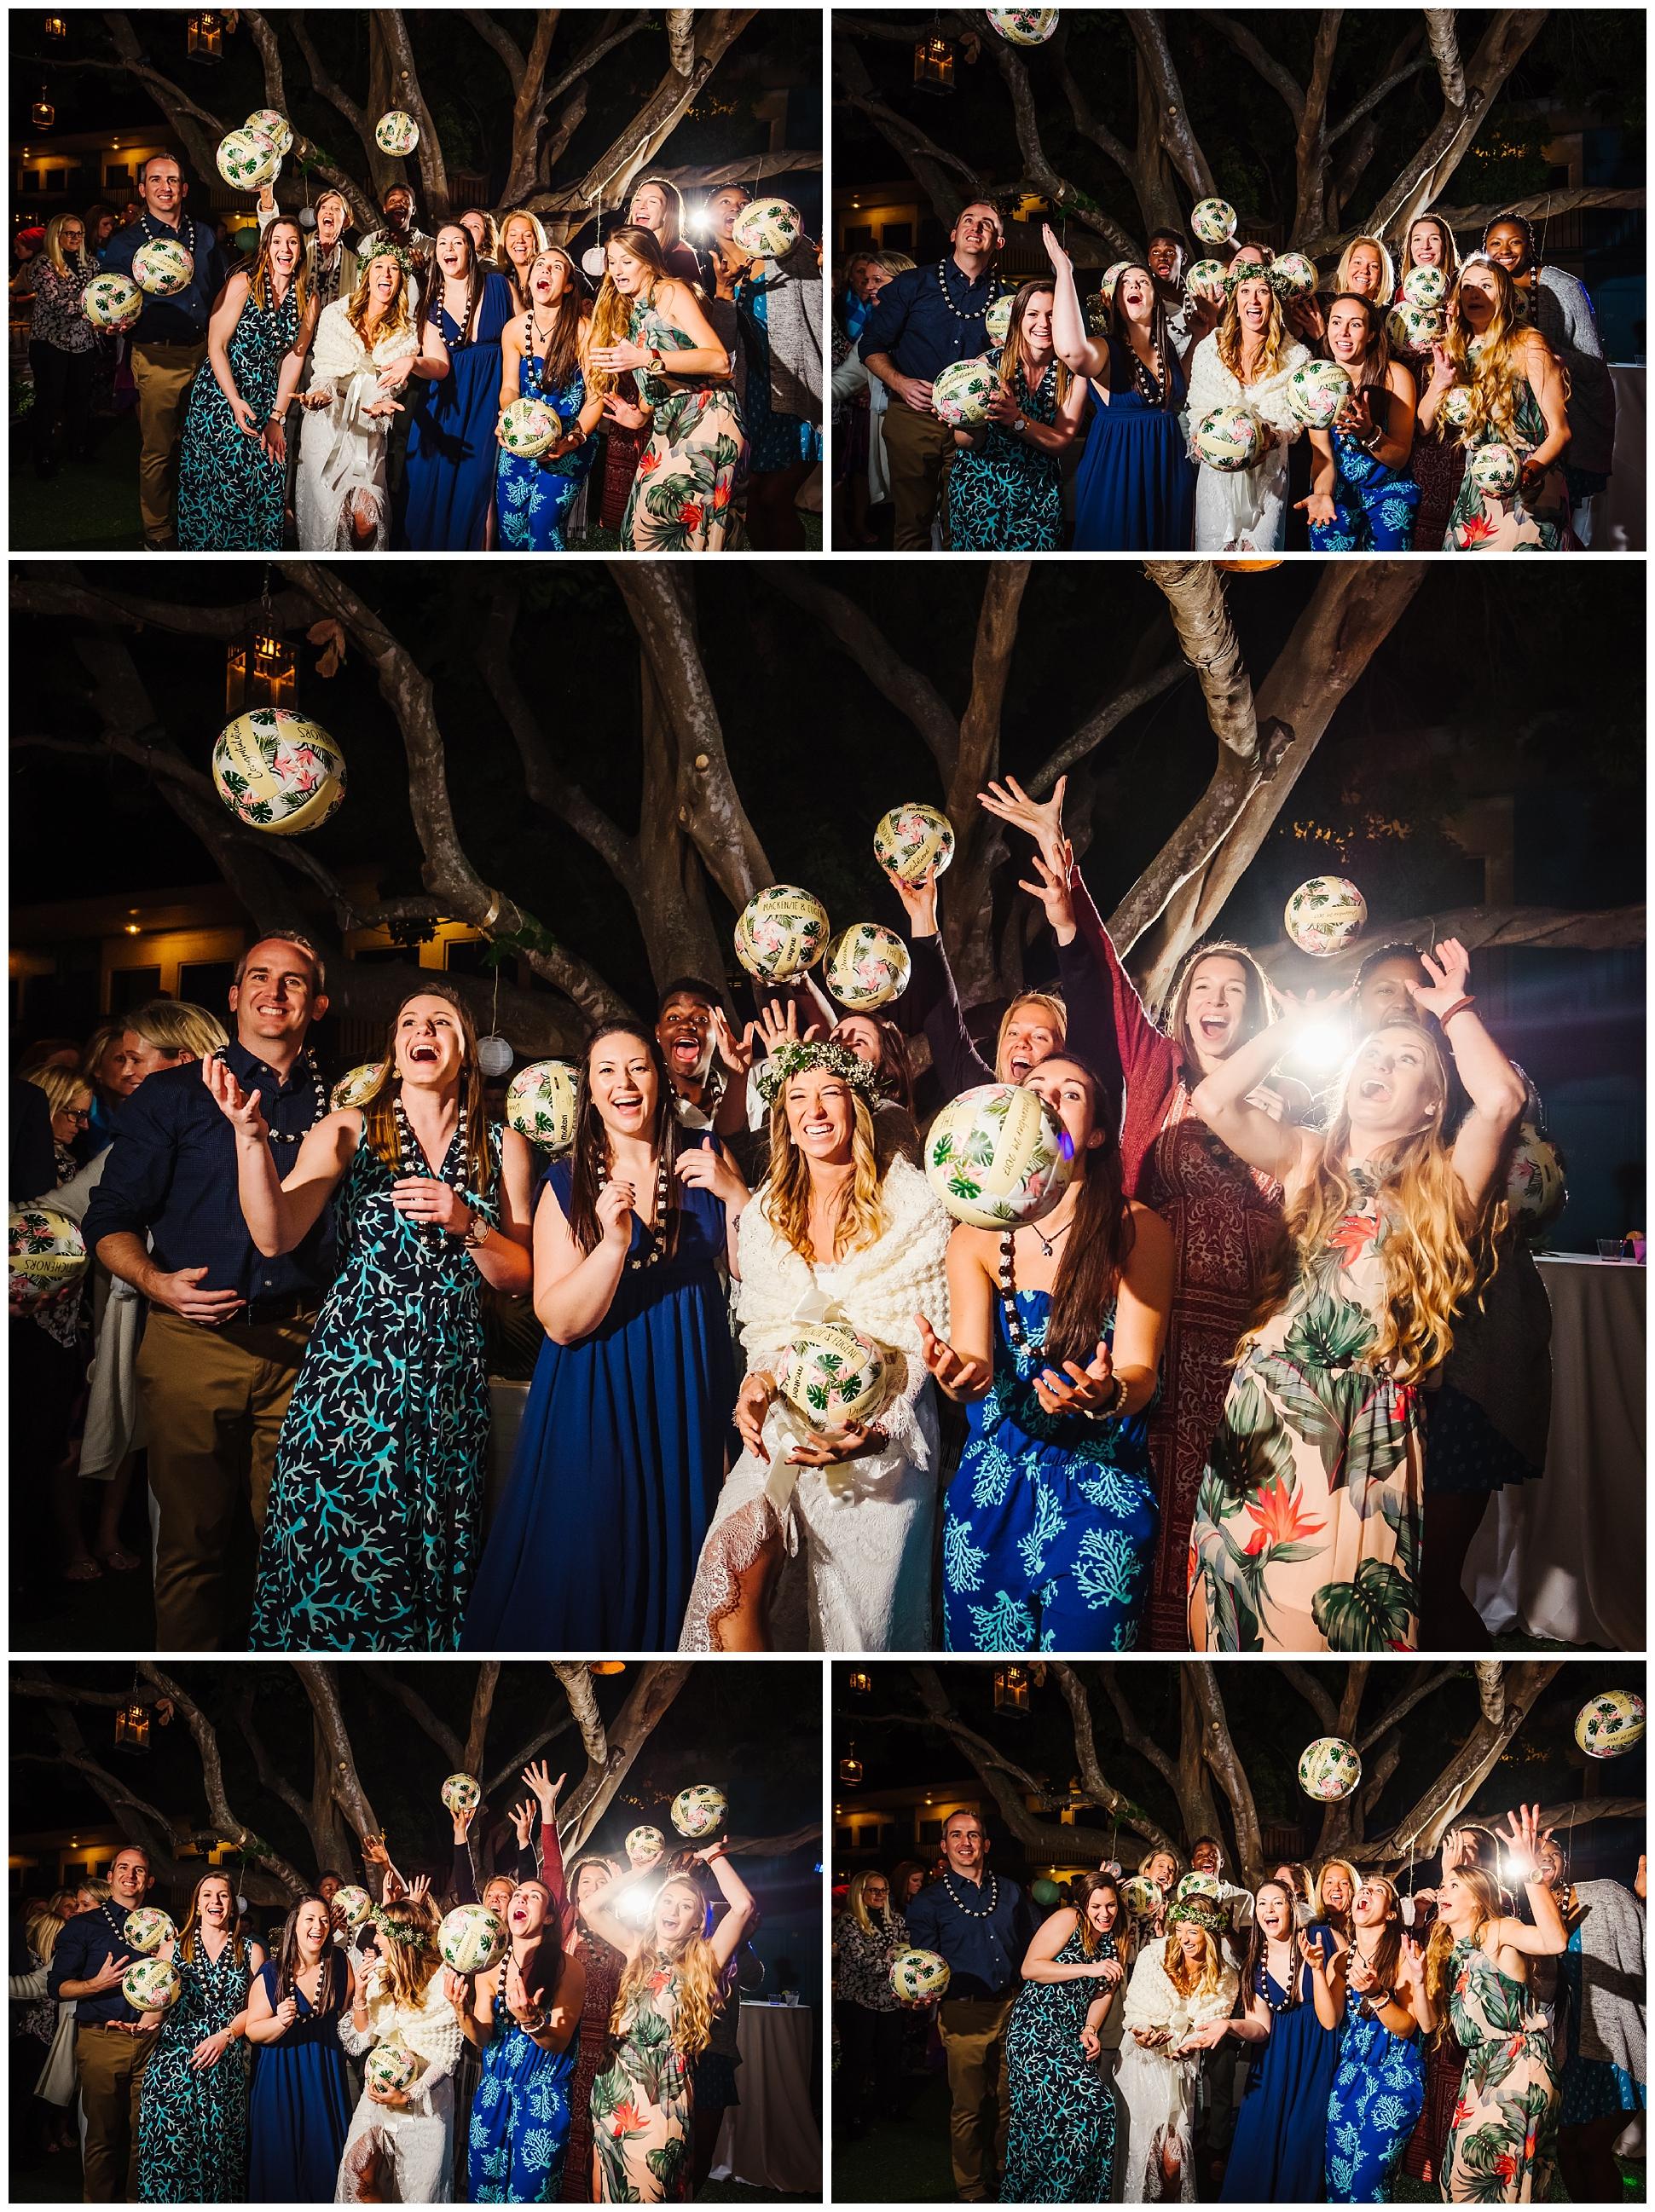 tampa-bay-wedding-photographer-barefoot-post-card-inn-tropical-hawaiin-lei-pink-pineapples-flower-crown_0203.jpg